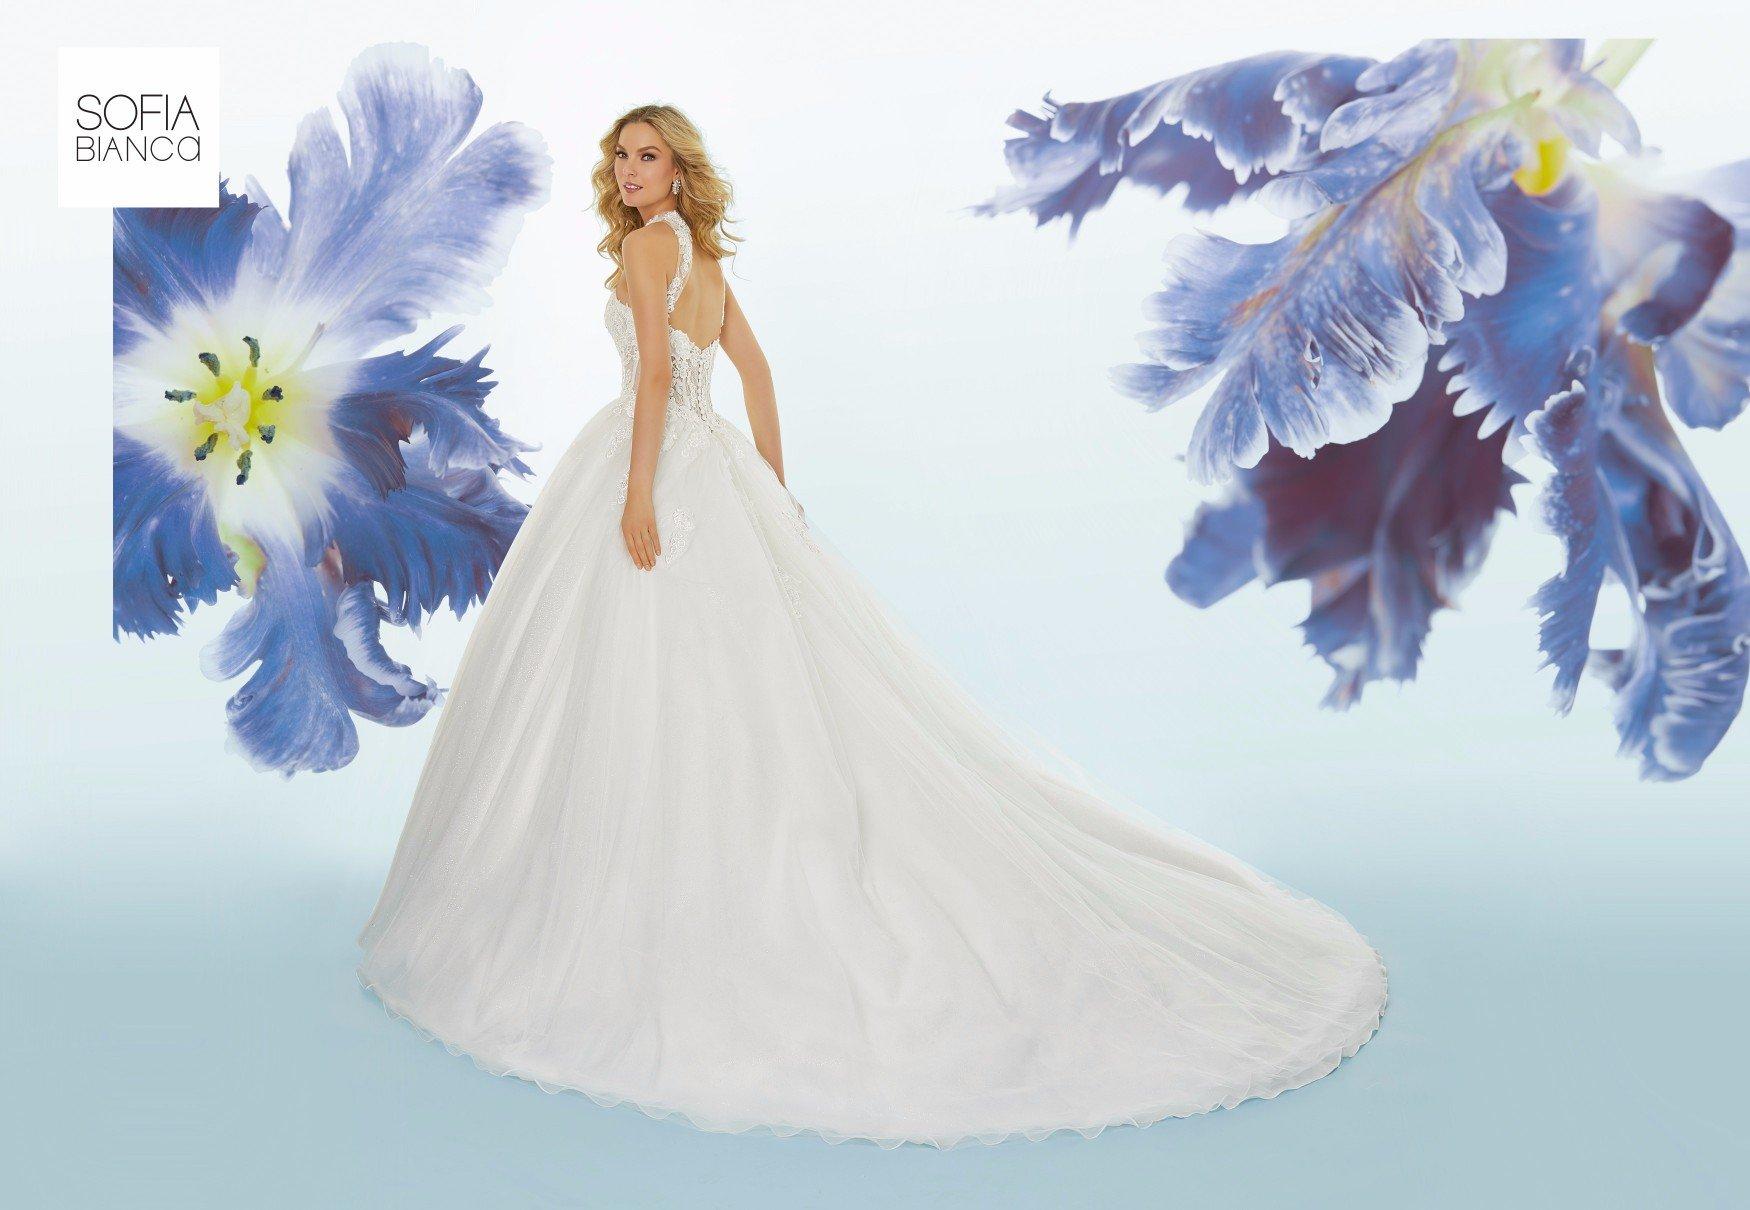 Abito per matrimoni bianco ed elegante